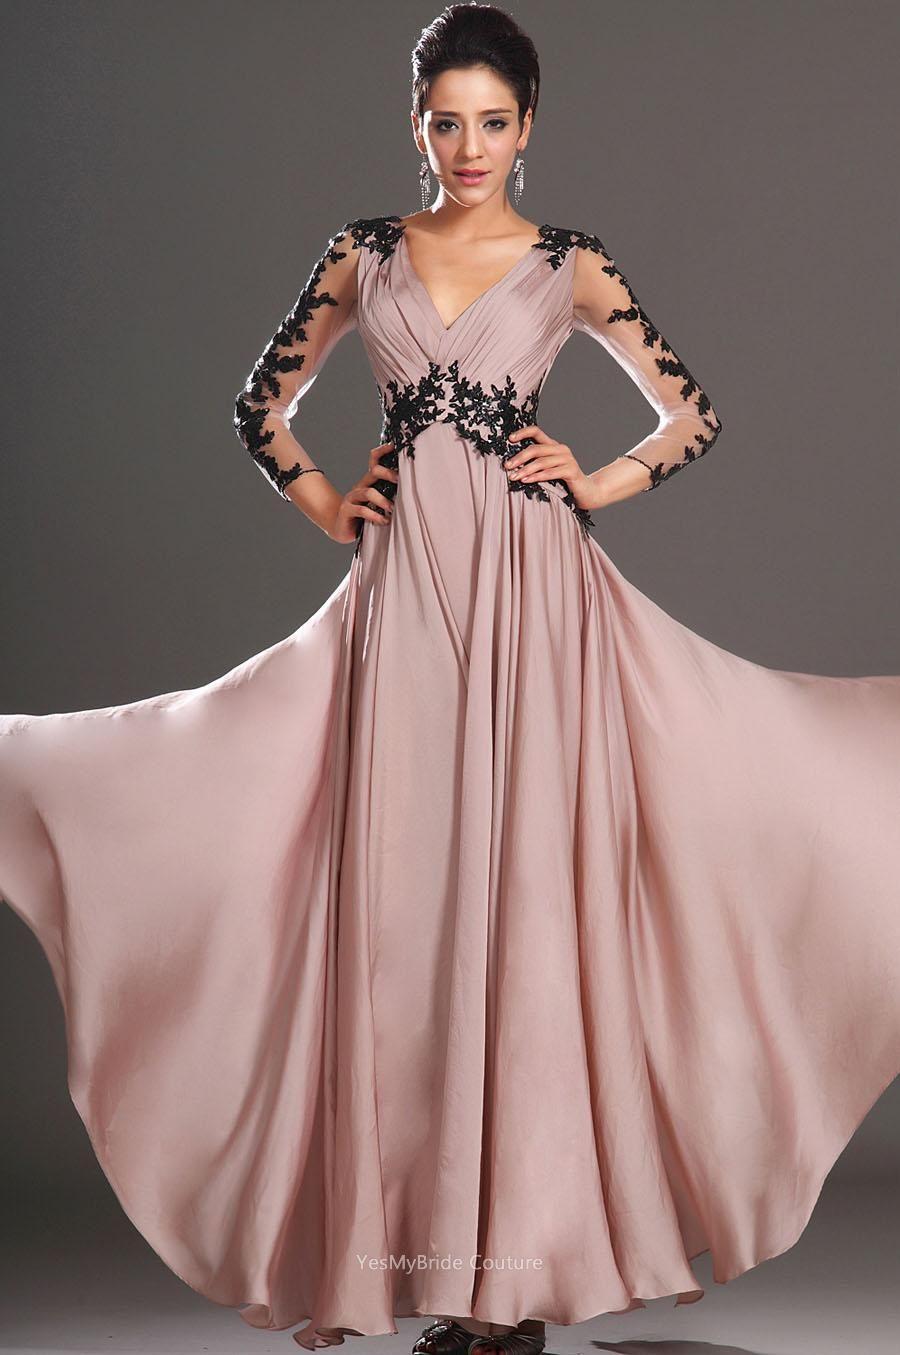 Bette Midler #night dress   Clothes   Pinterest   Alta costura ...